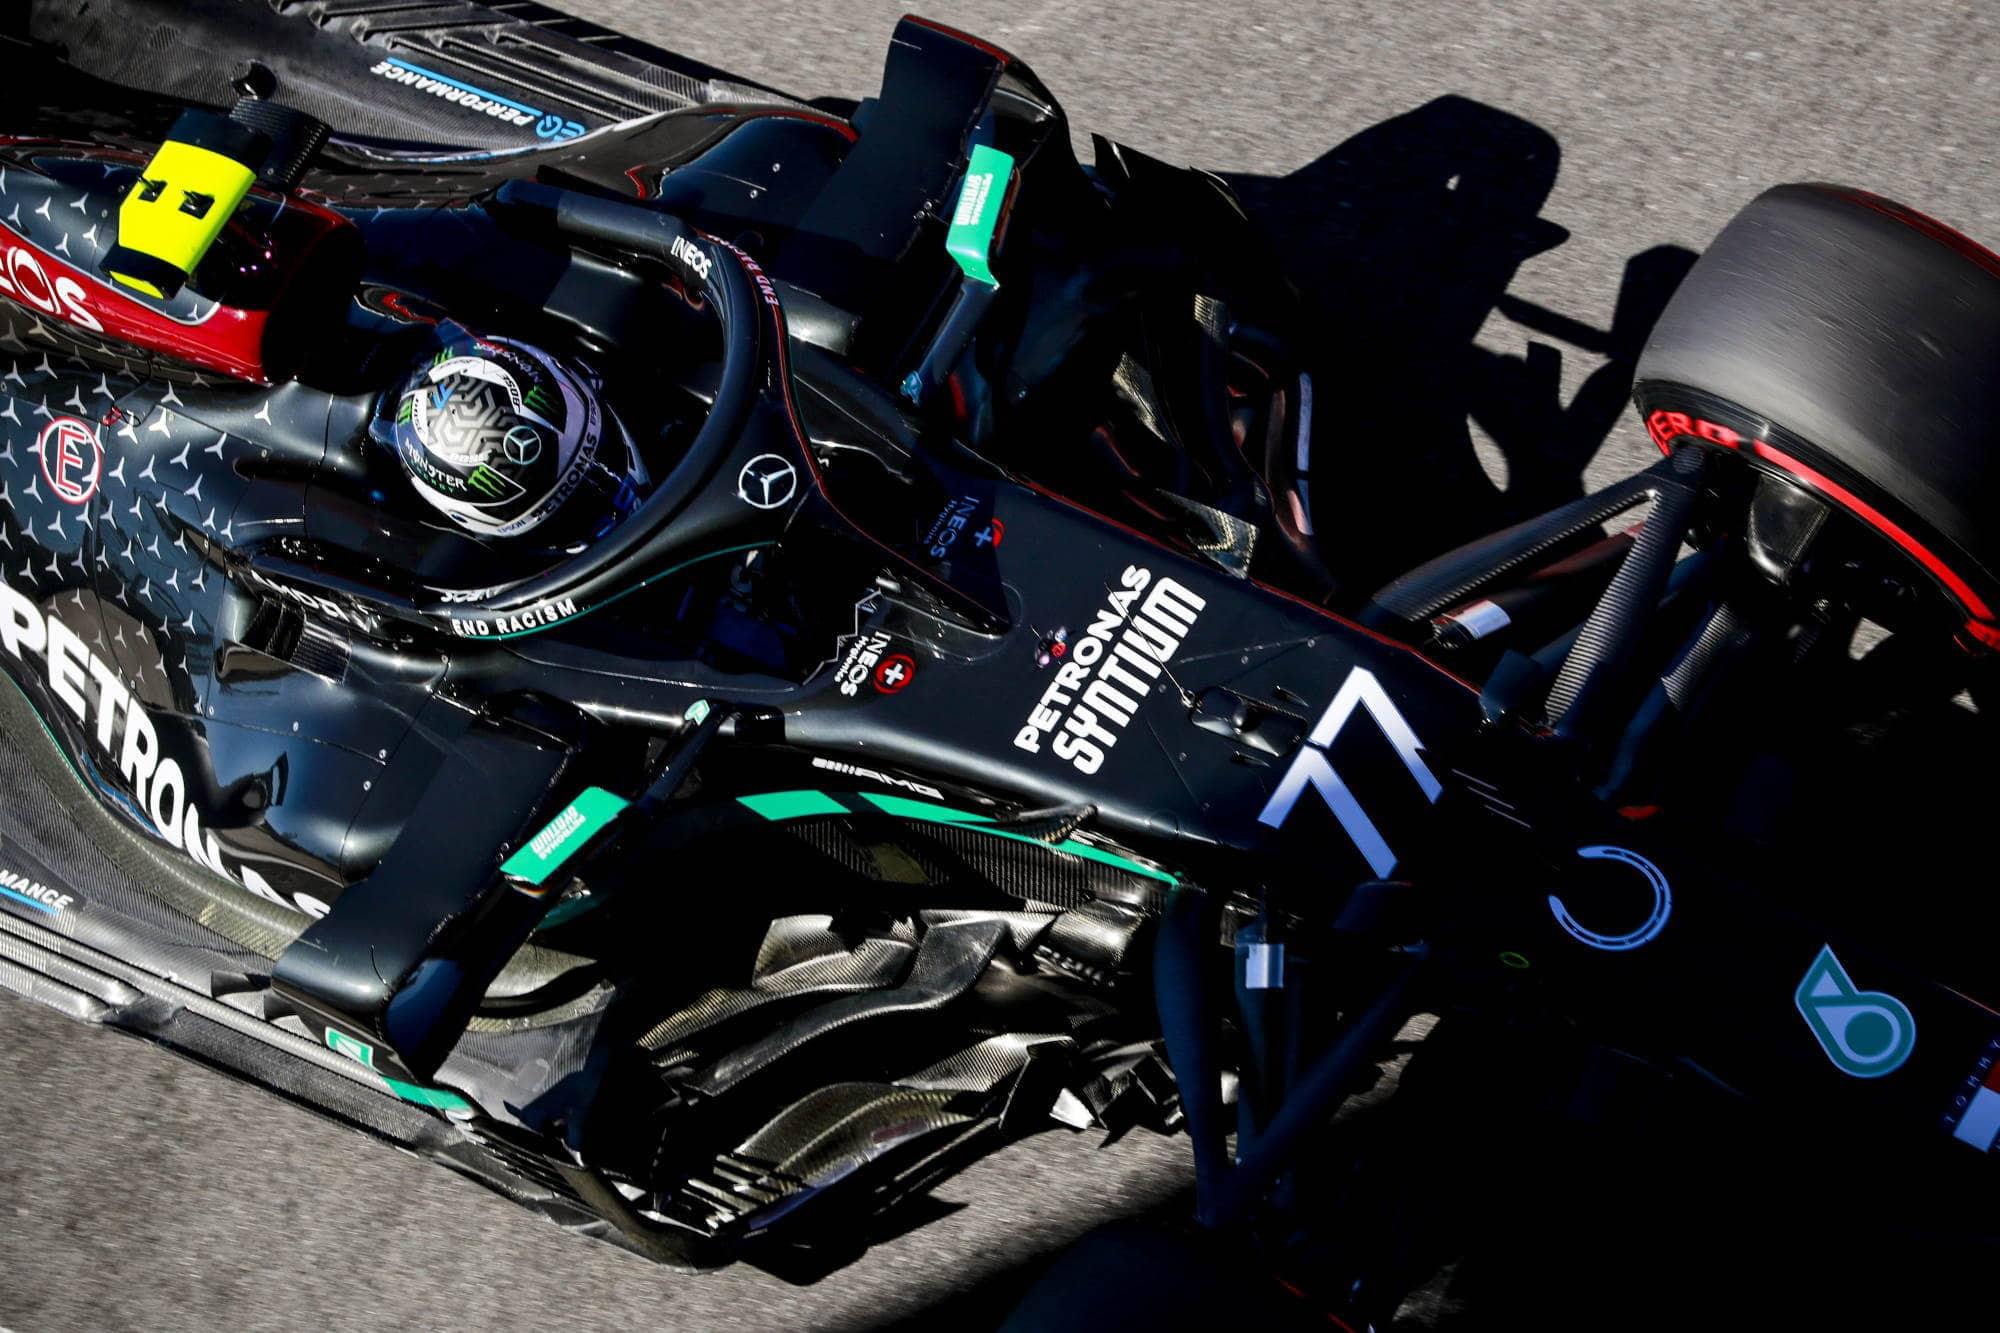 2020 British GP Bottas soft Pirelli top shot Photo Daimler